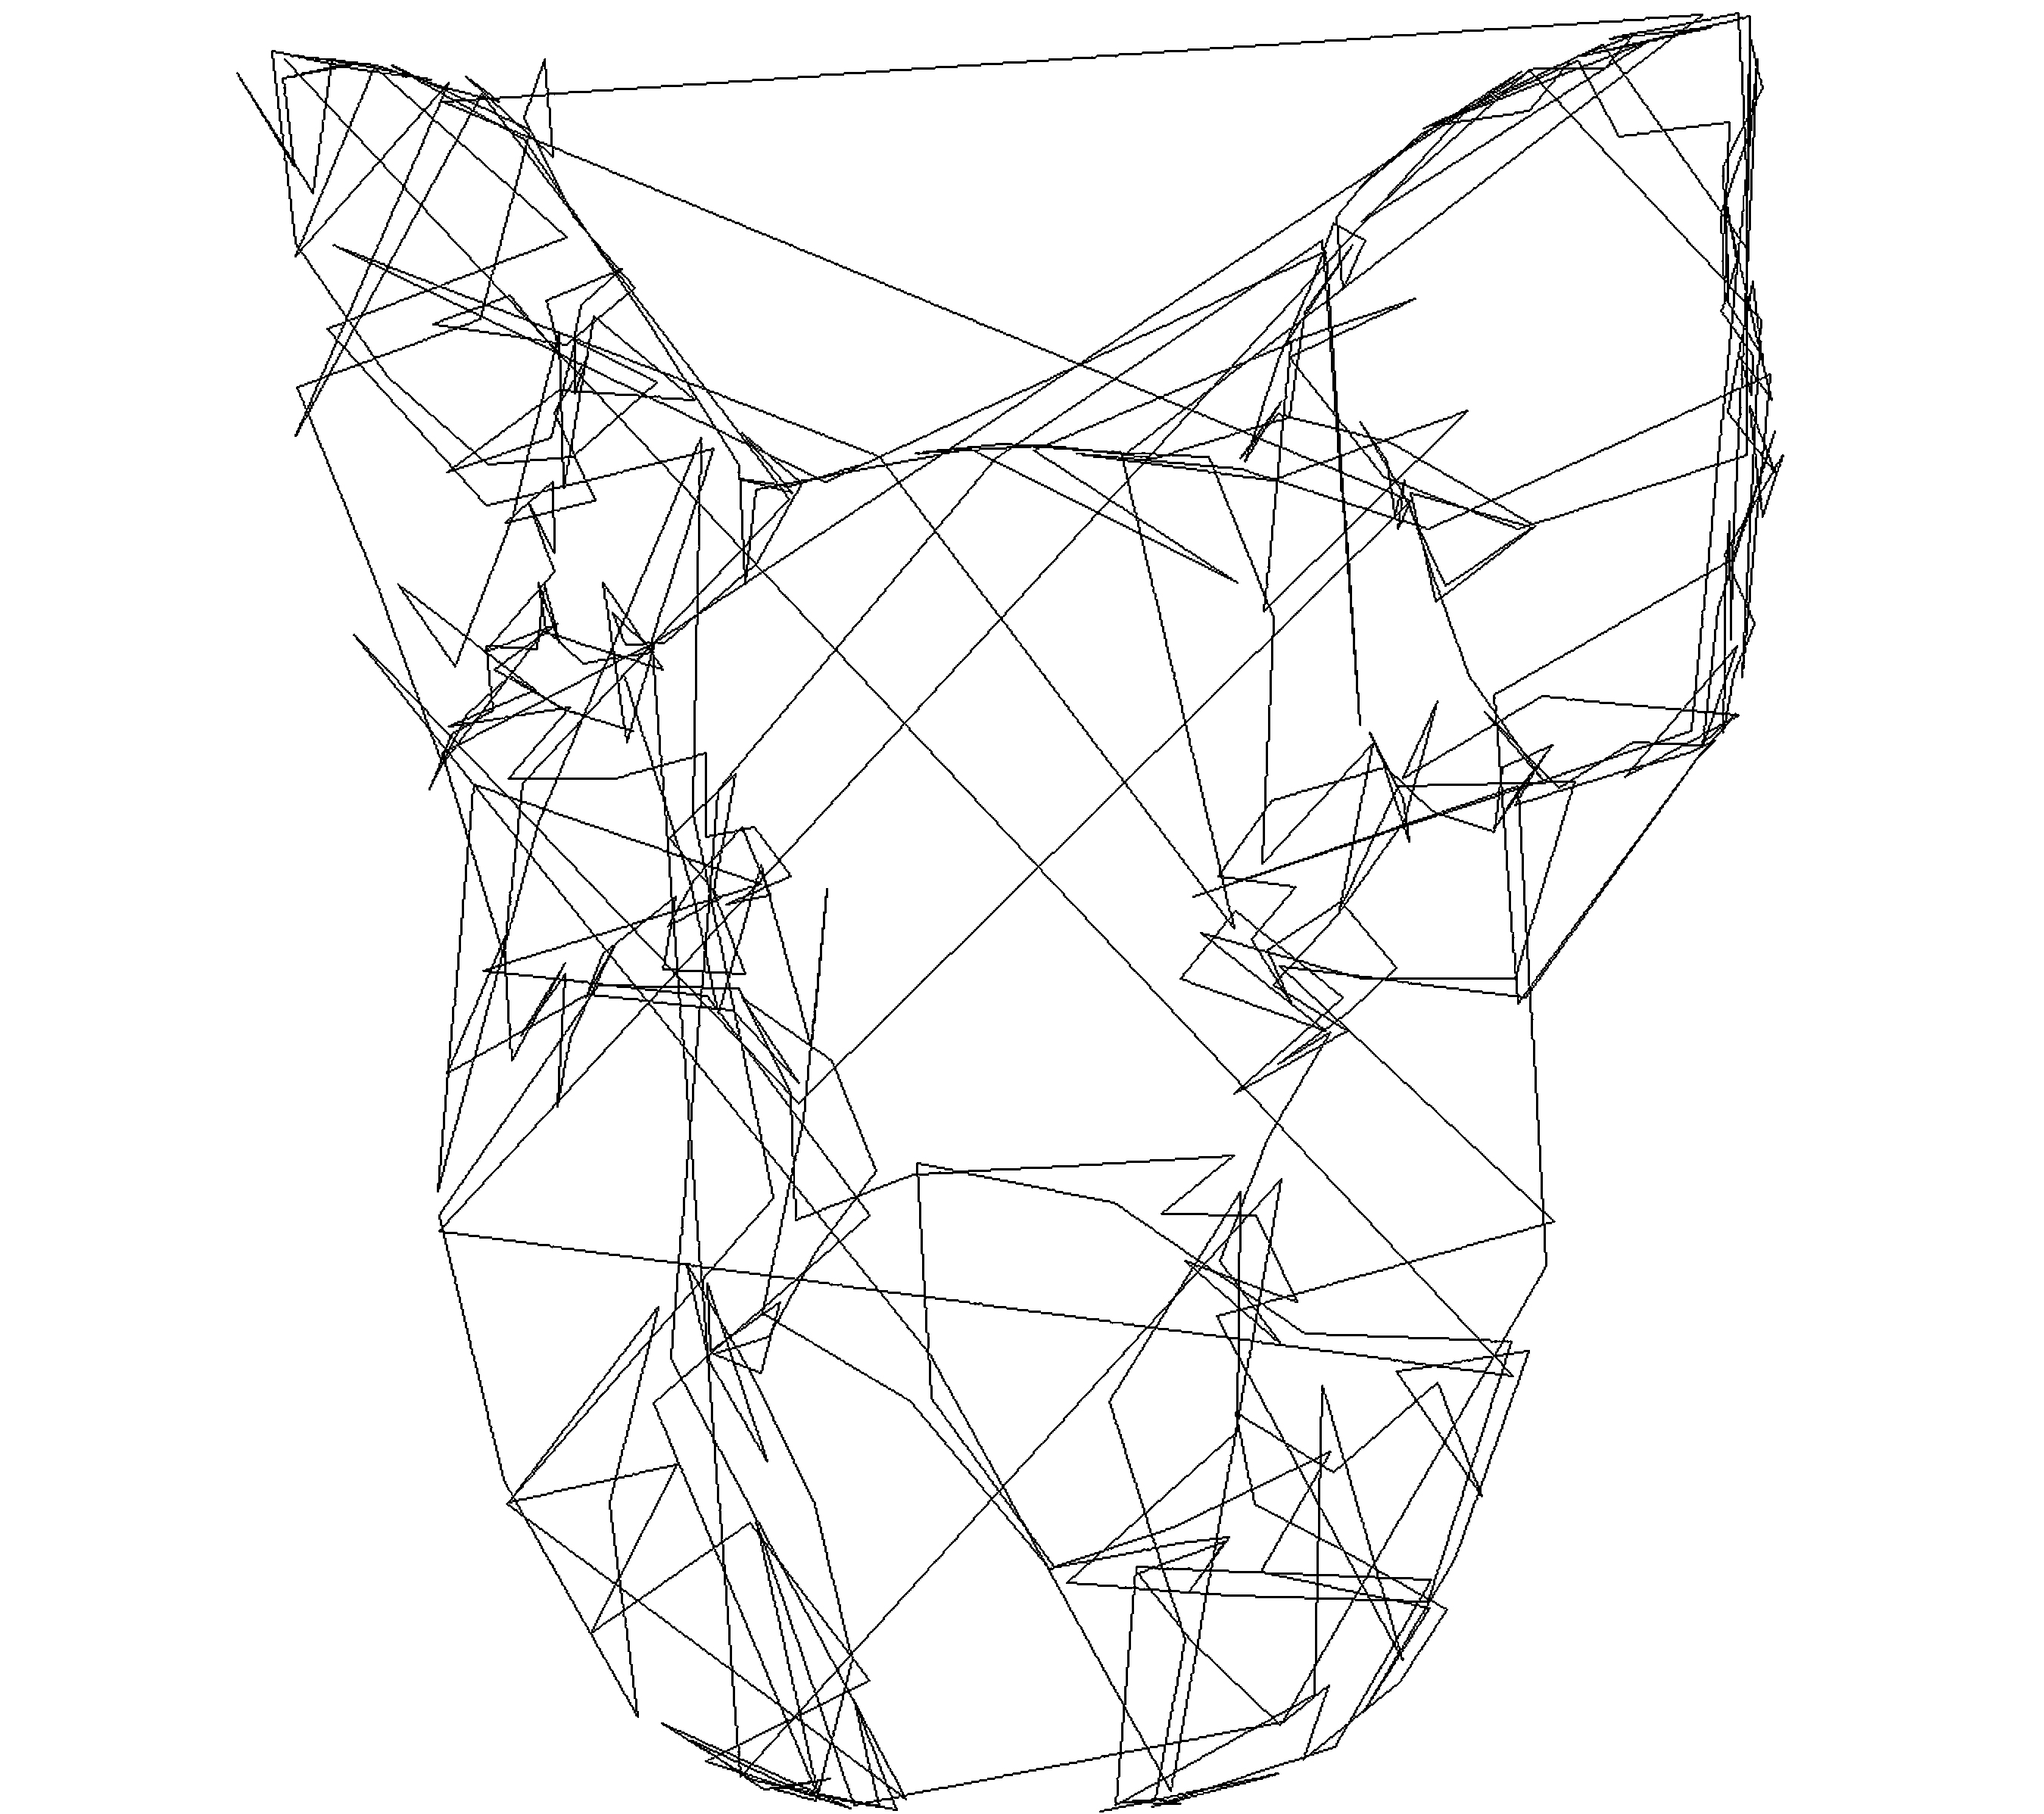 outline_image0